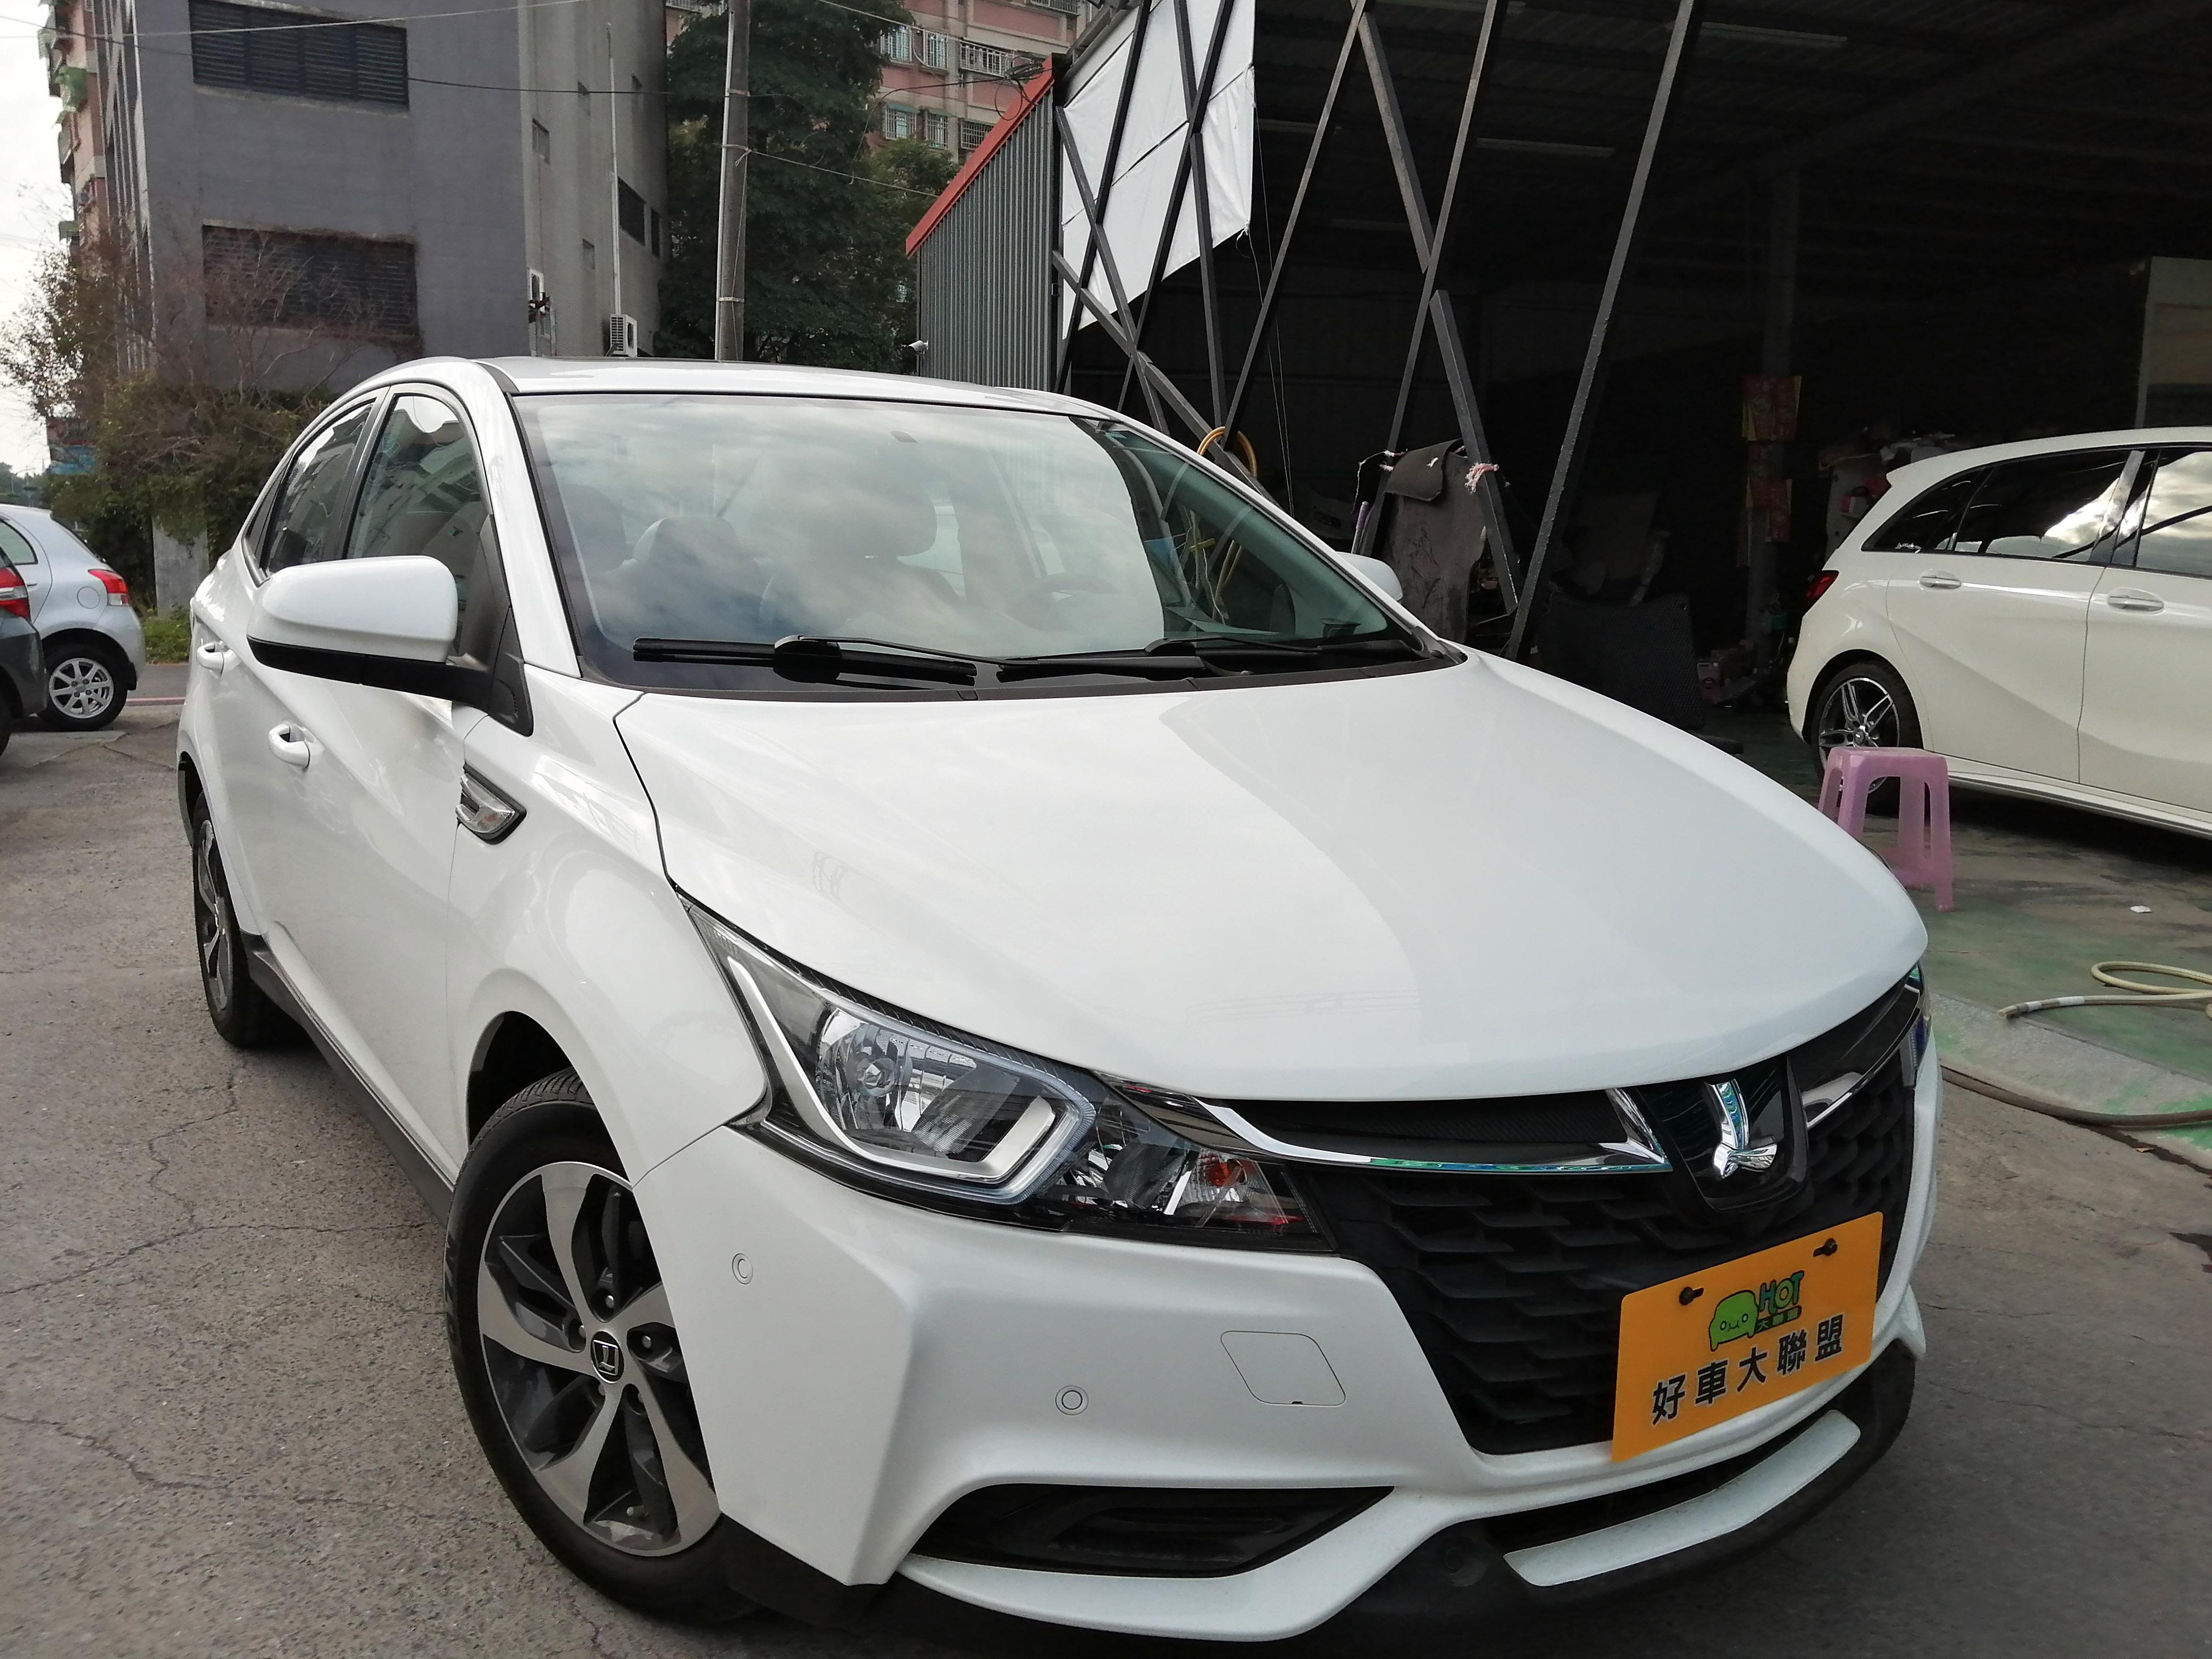 2018 Luxgen 納智捷 S3